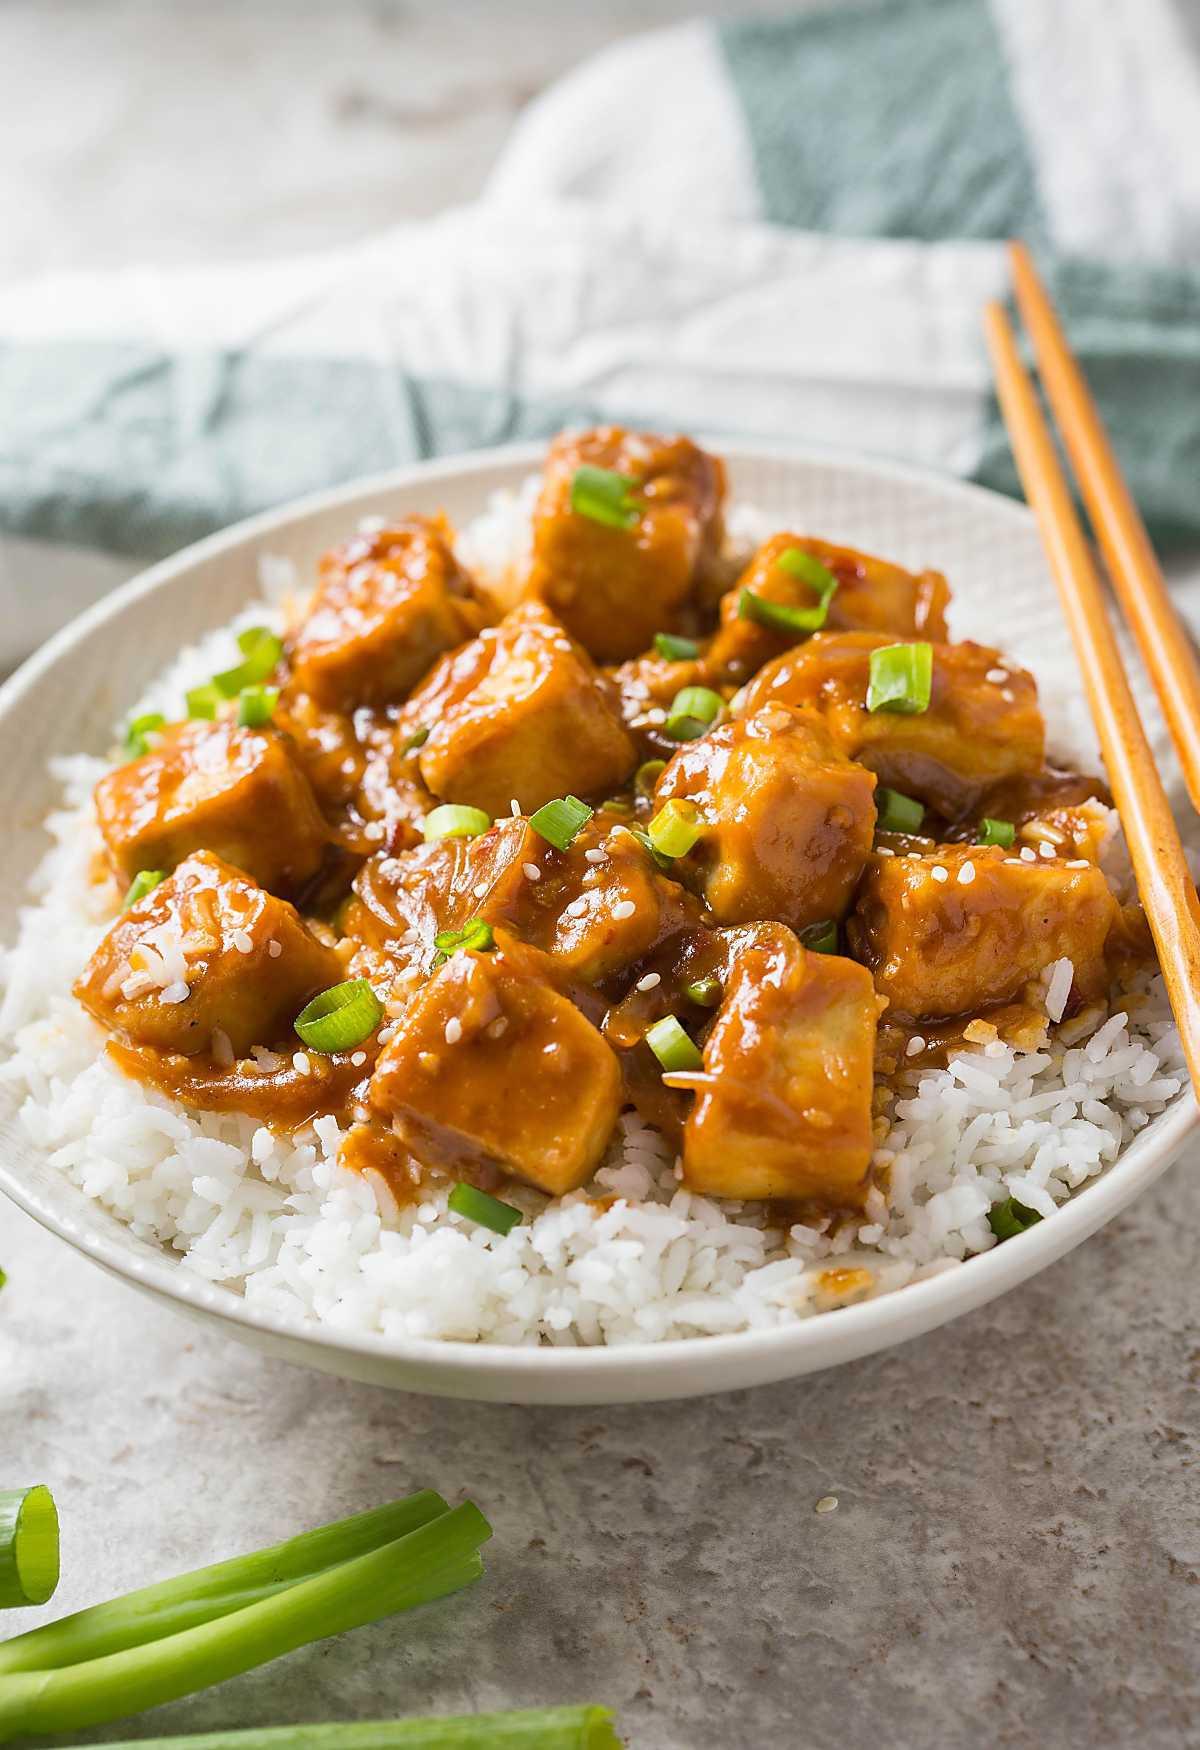 Healthy Asian Food Recipes  30 min Healthy Asian chili garlic tofu stir fry e Pan